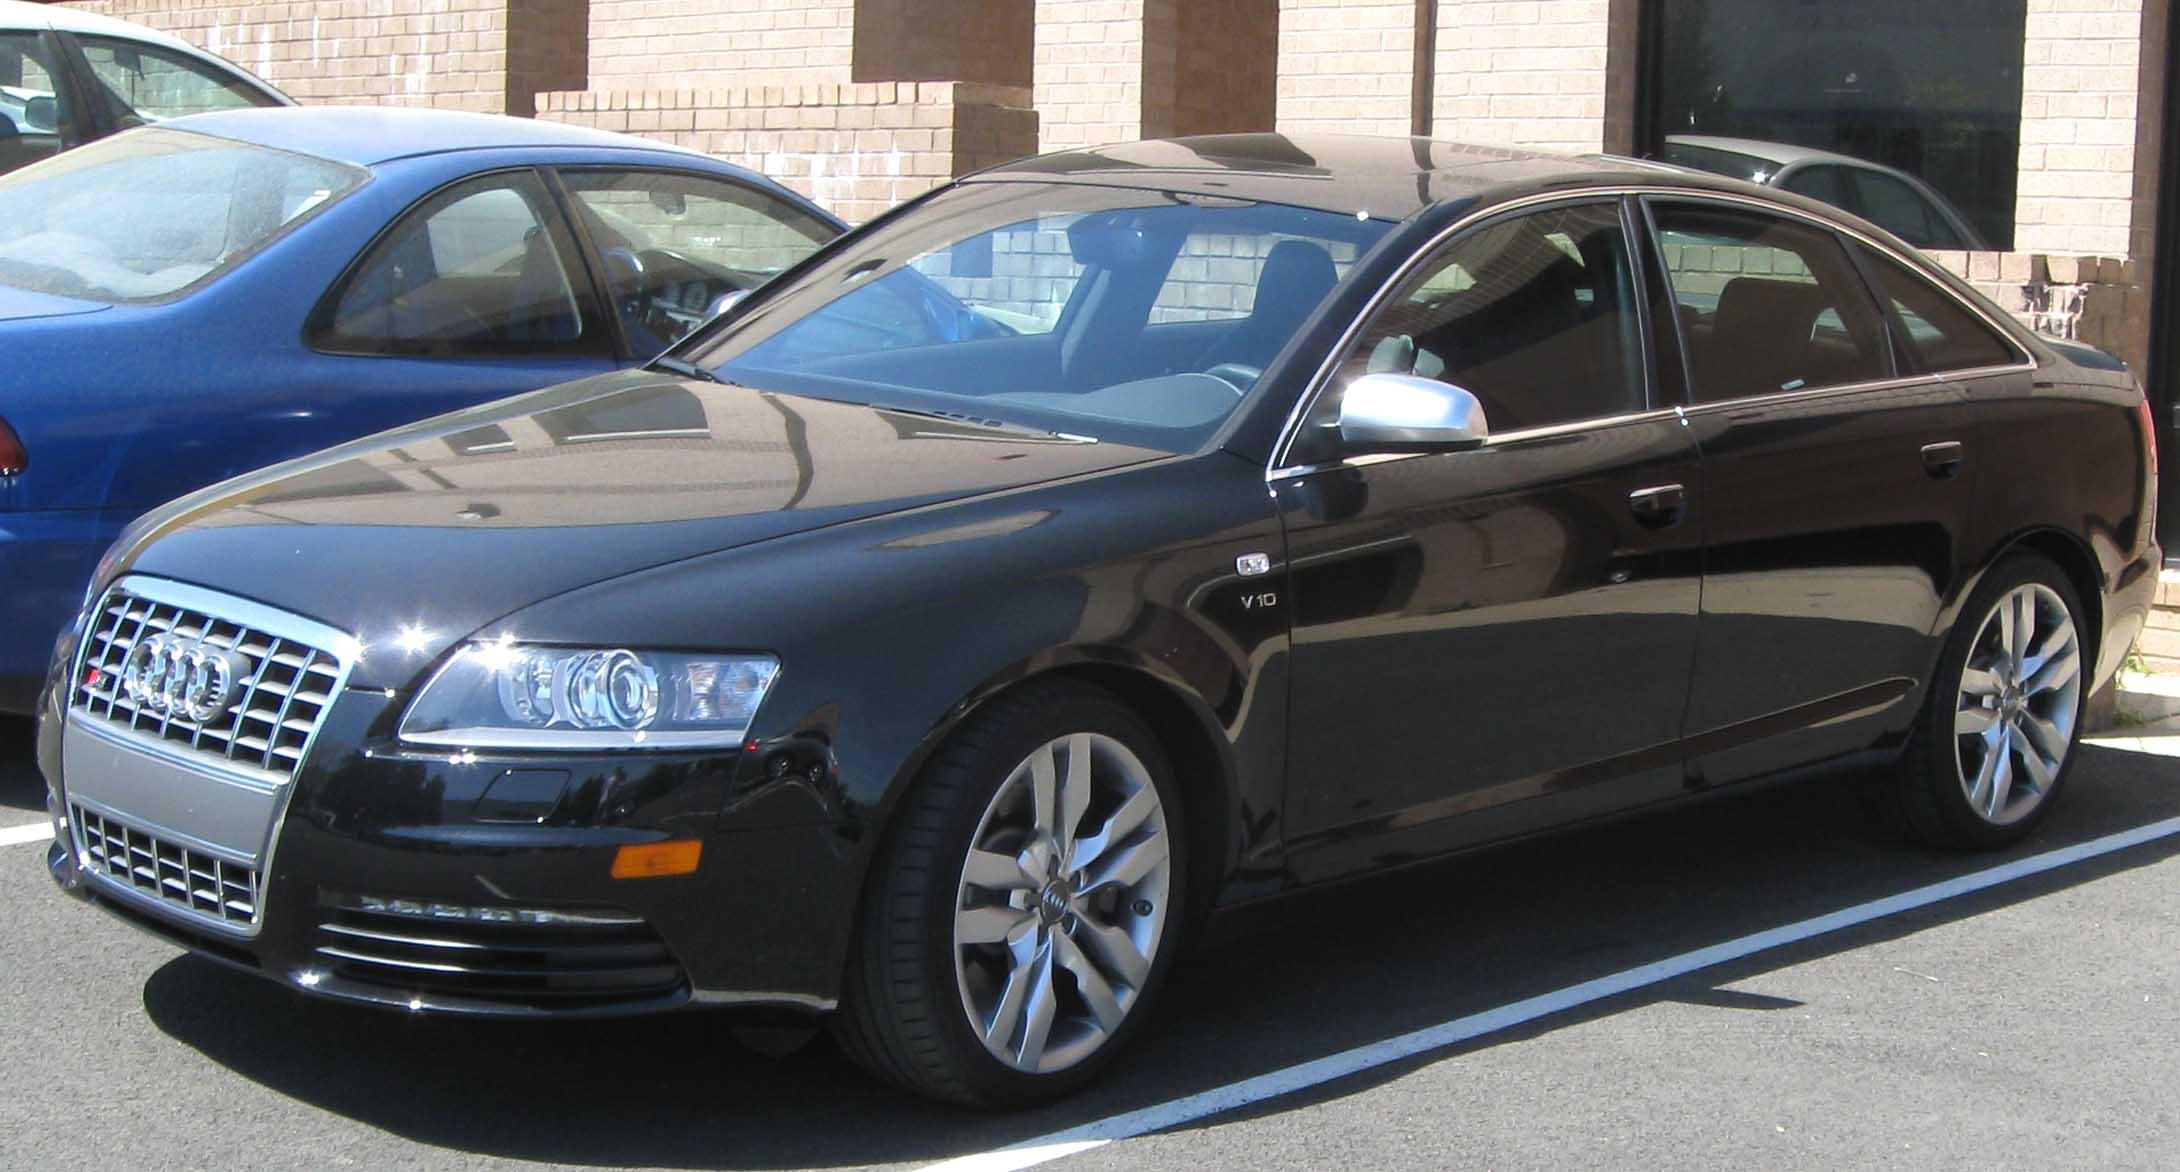 2009 Audi S6 Image 14